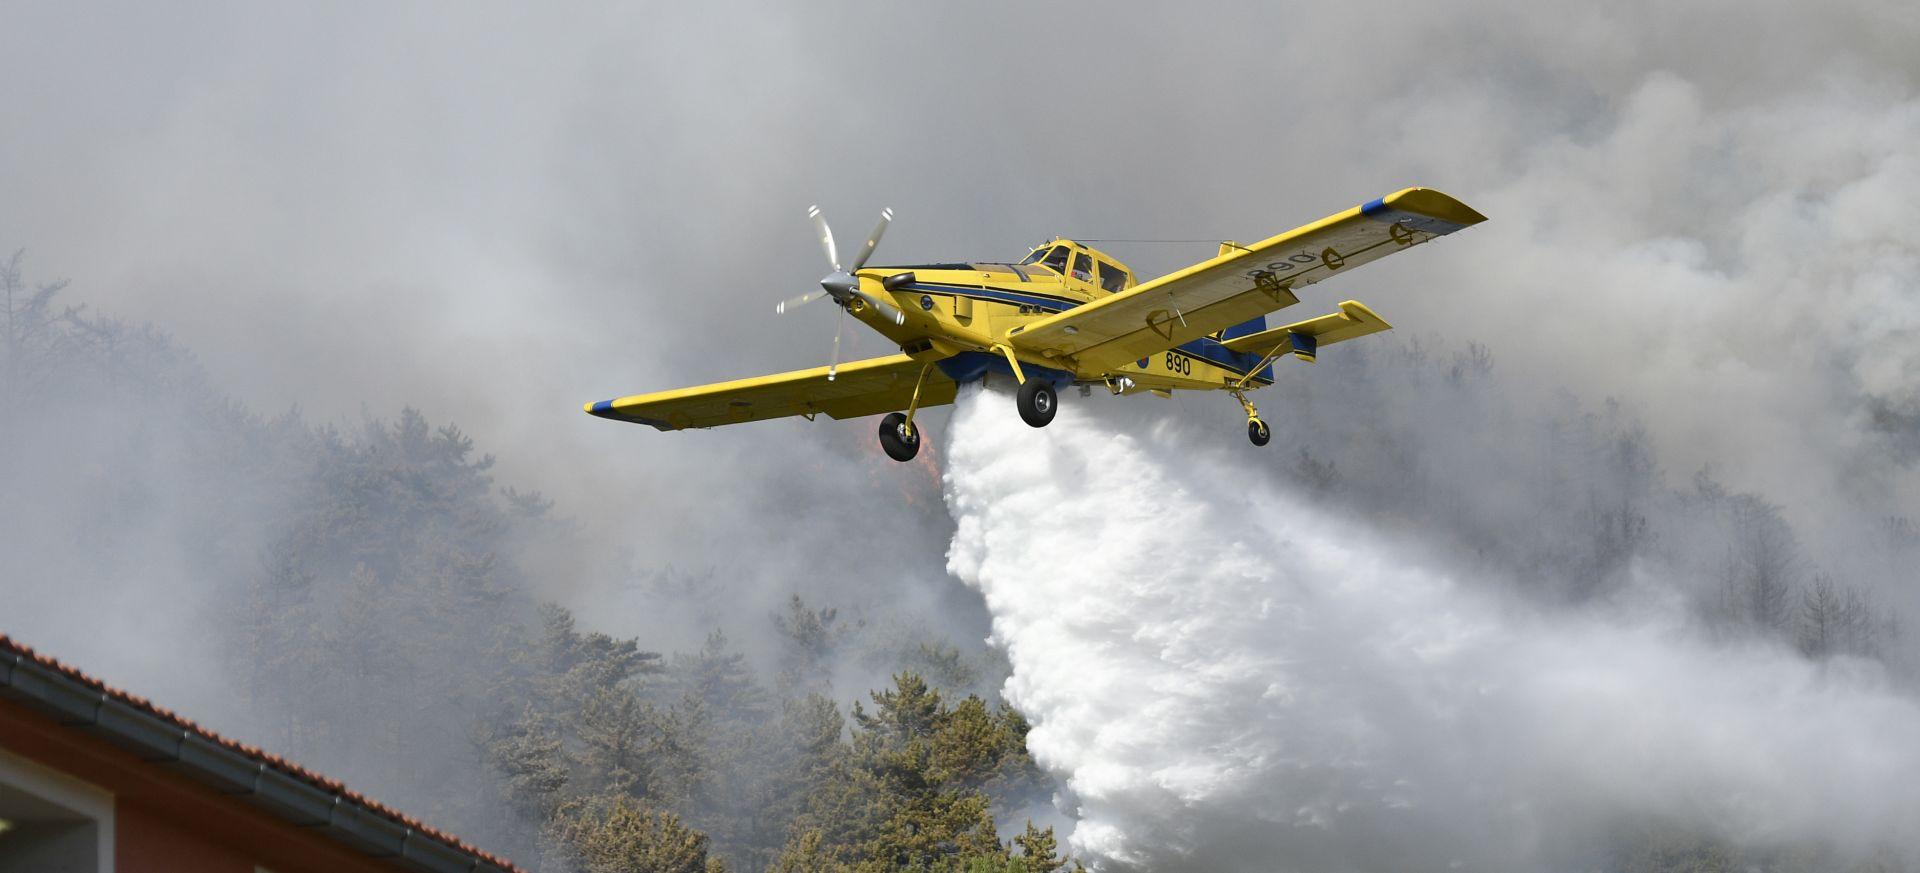 MORH Tri Airtractora gase novo požarište kod Knina